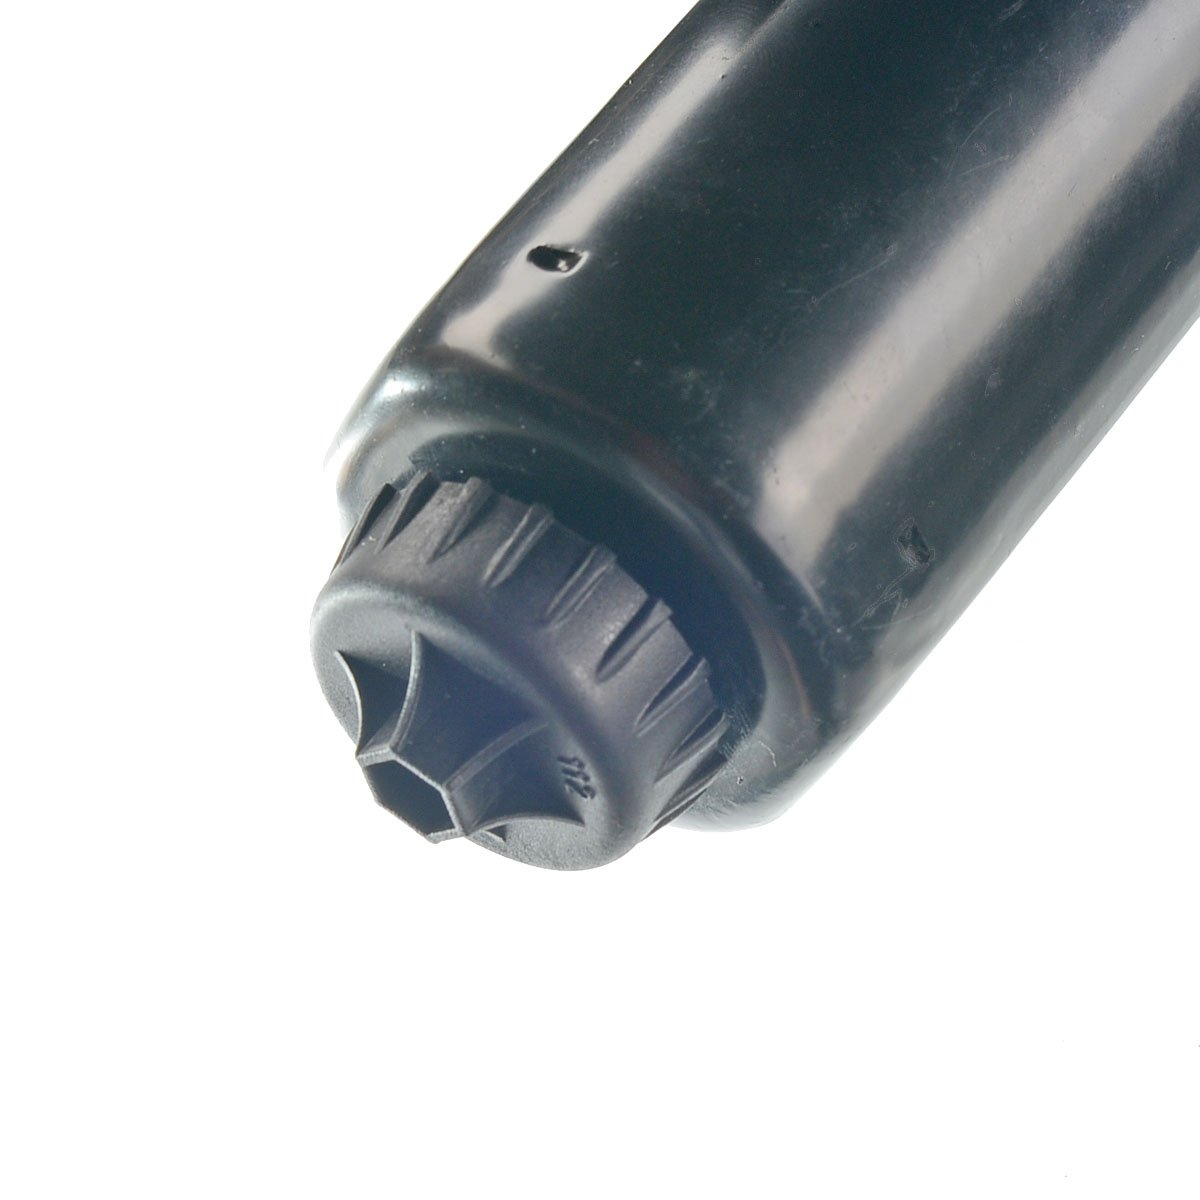 A-Premium Headlight Headlamp Motor for Chevrolet Corvette 2000-2004 Front Left Driver Side PremiumpartsWhosale